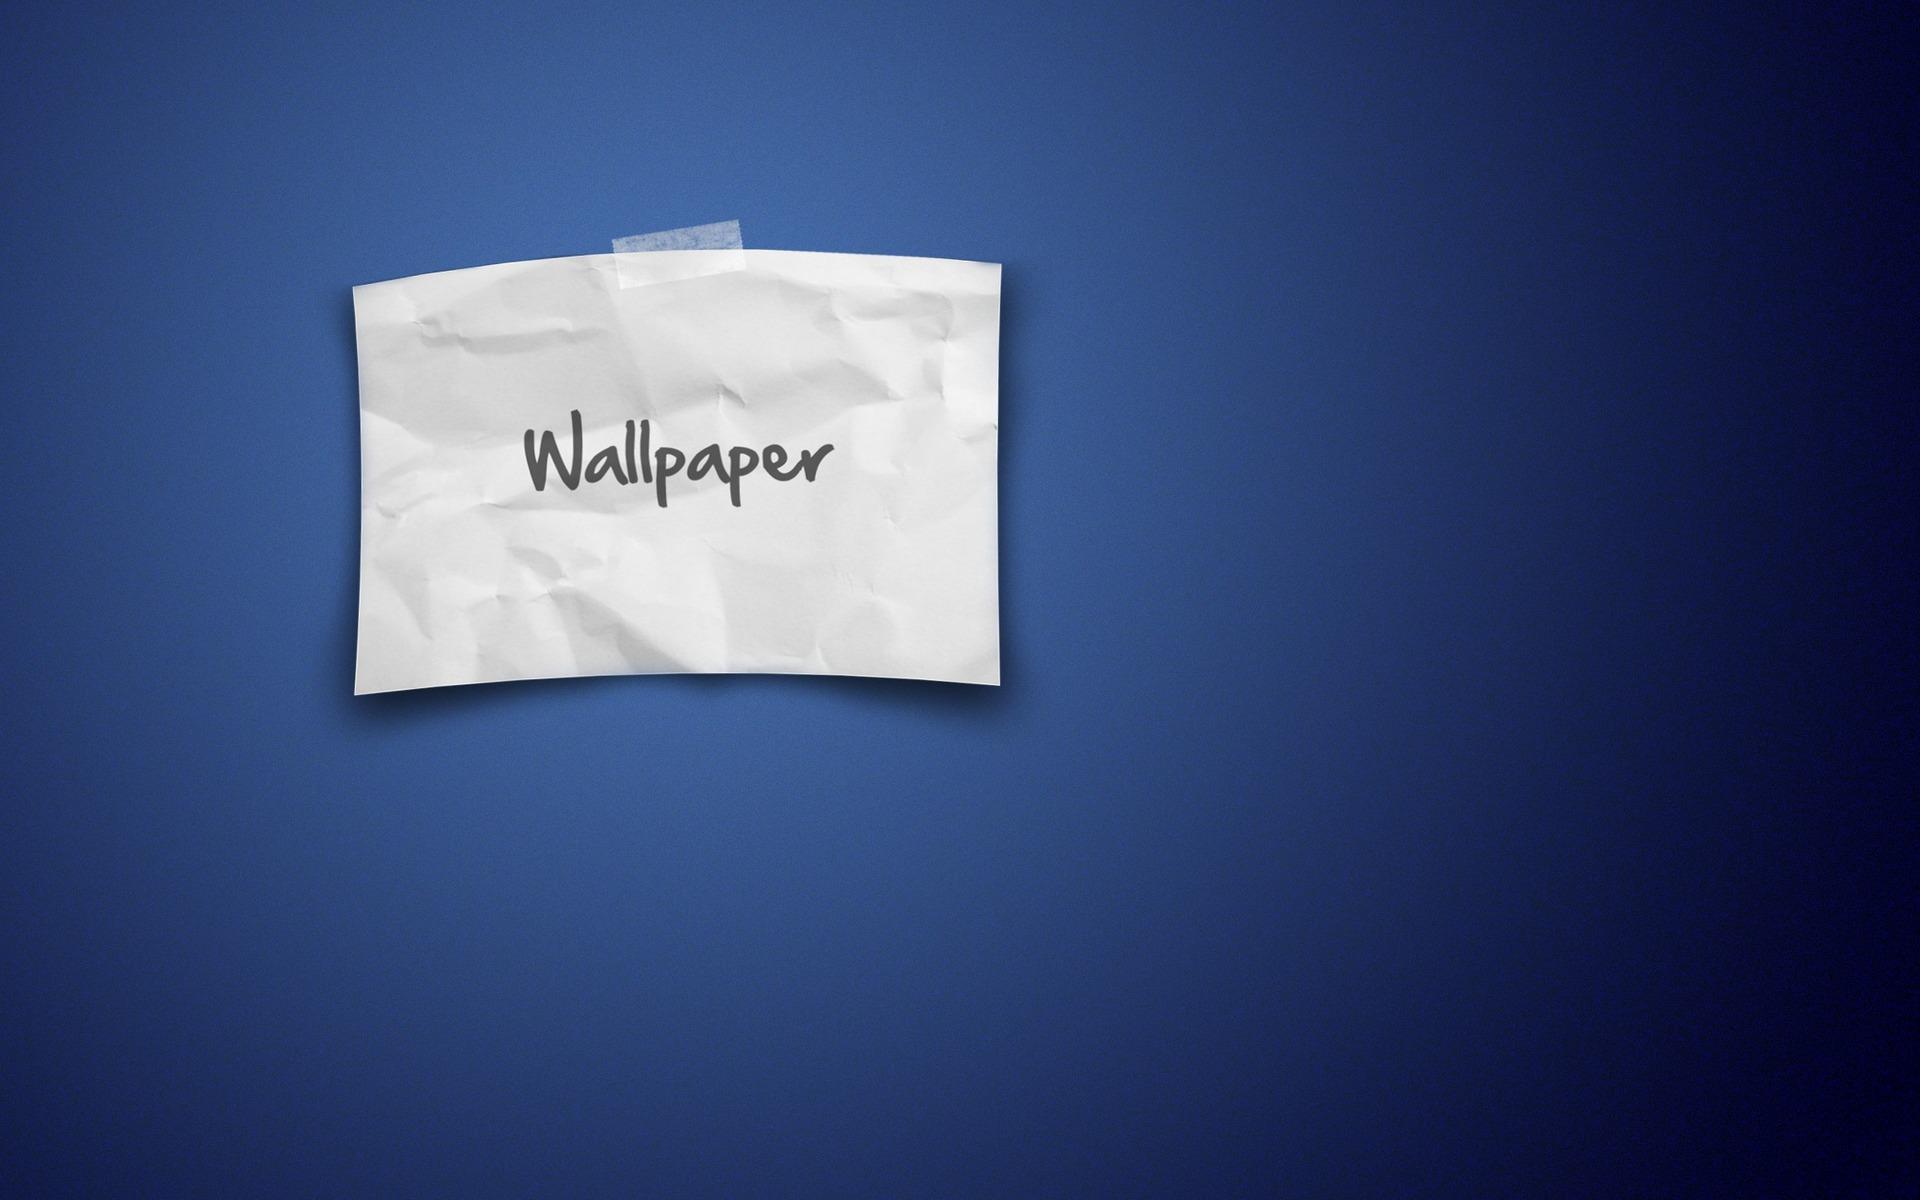 Good Wallpaper Mac Creative - Creative_Wallpaper_Minimal_wallpaper_034715_  Snapshot_827698.jpg